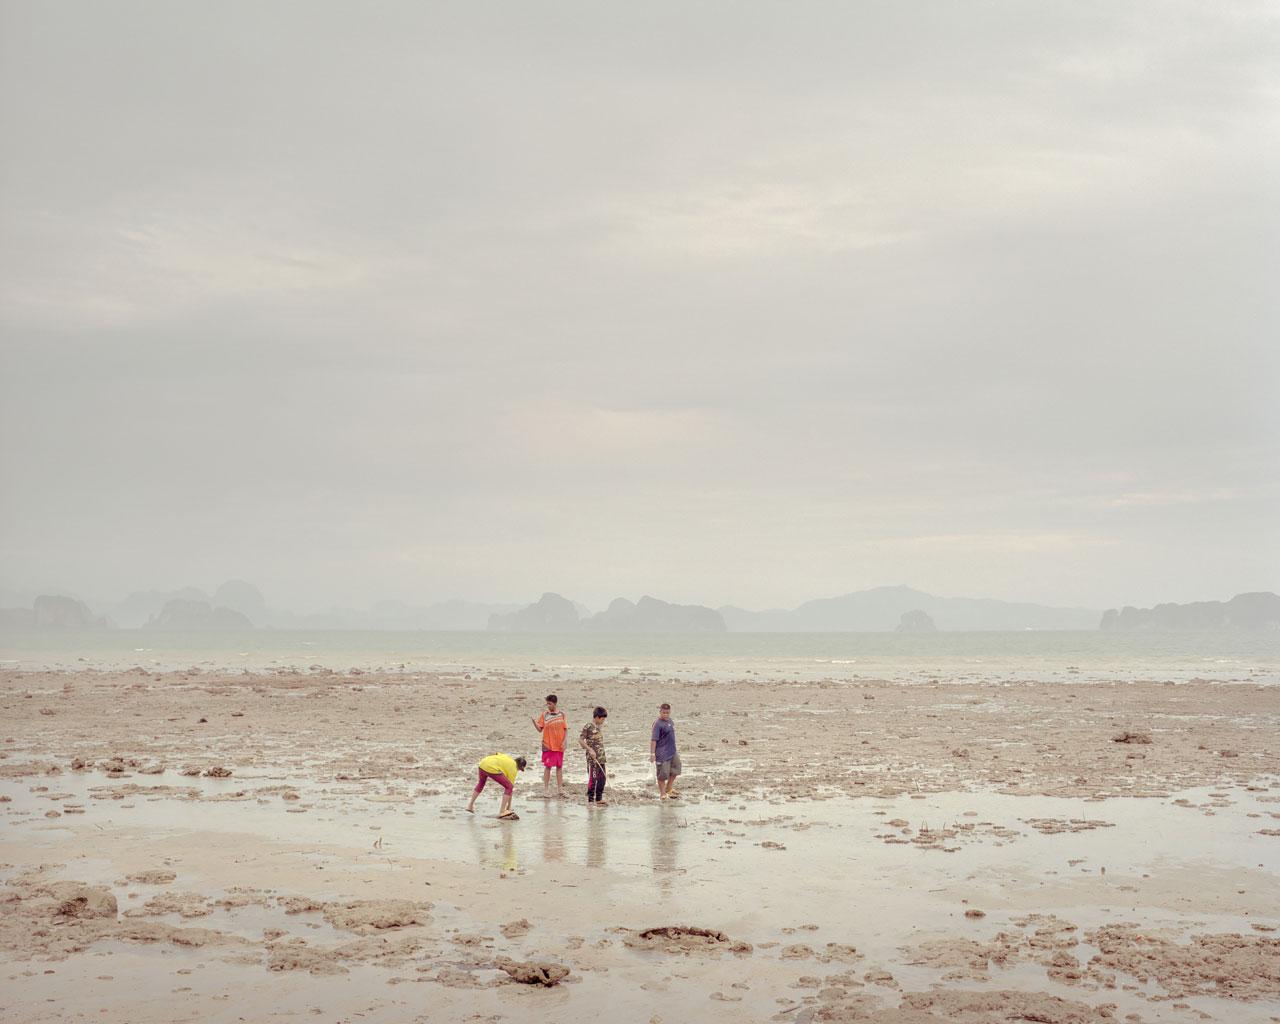 Beachcombing – crabs, Ko Yao Noi, Thailand - Photo by Ákos Major